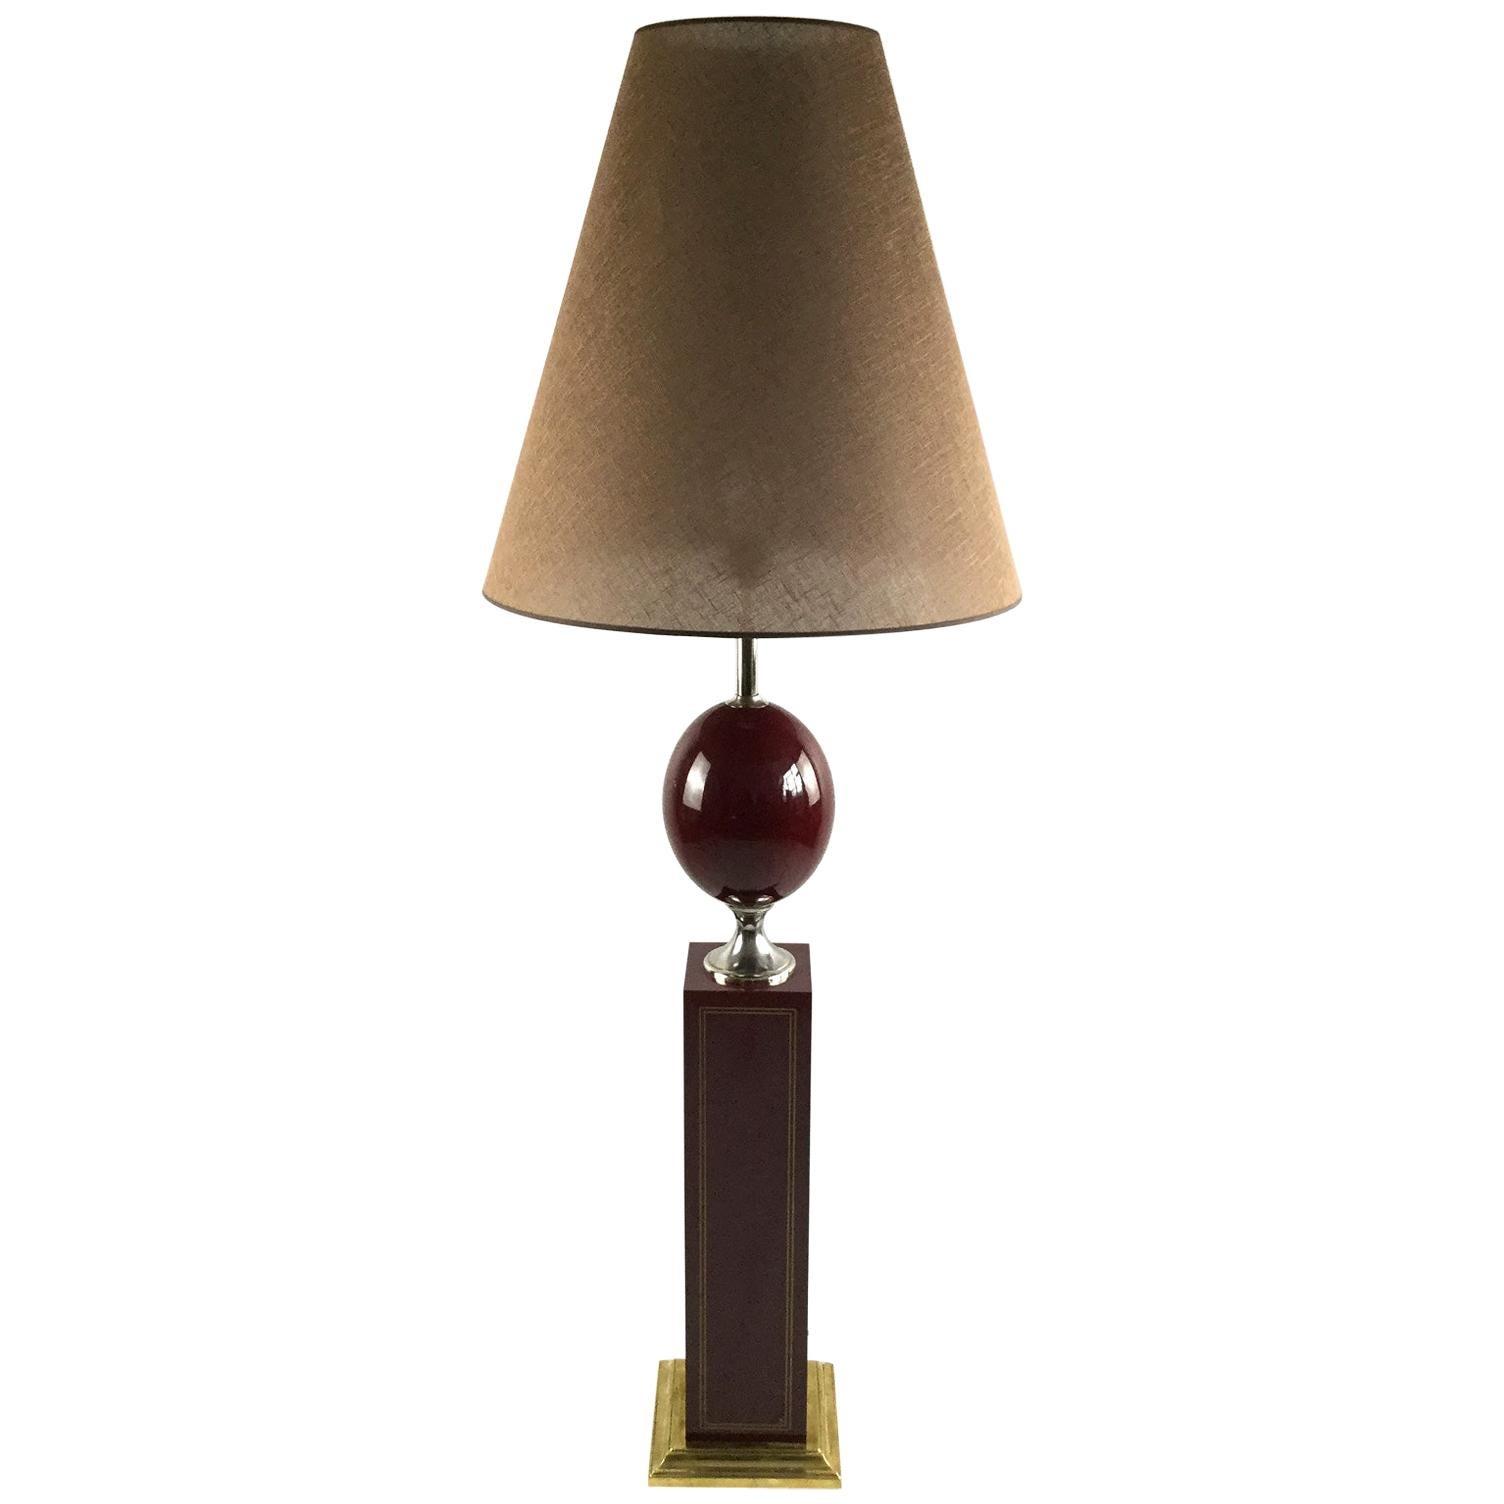 Maison Le Dauphin Floor Lamp France 1970s